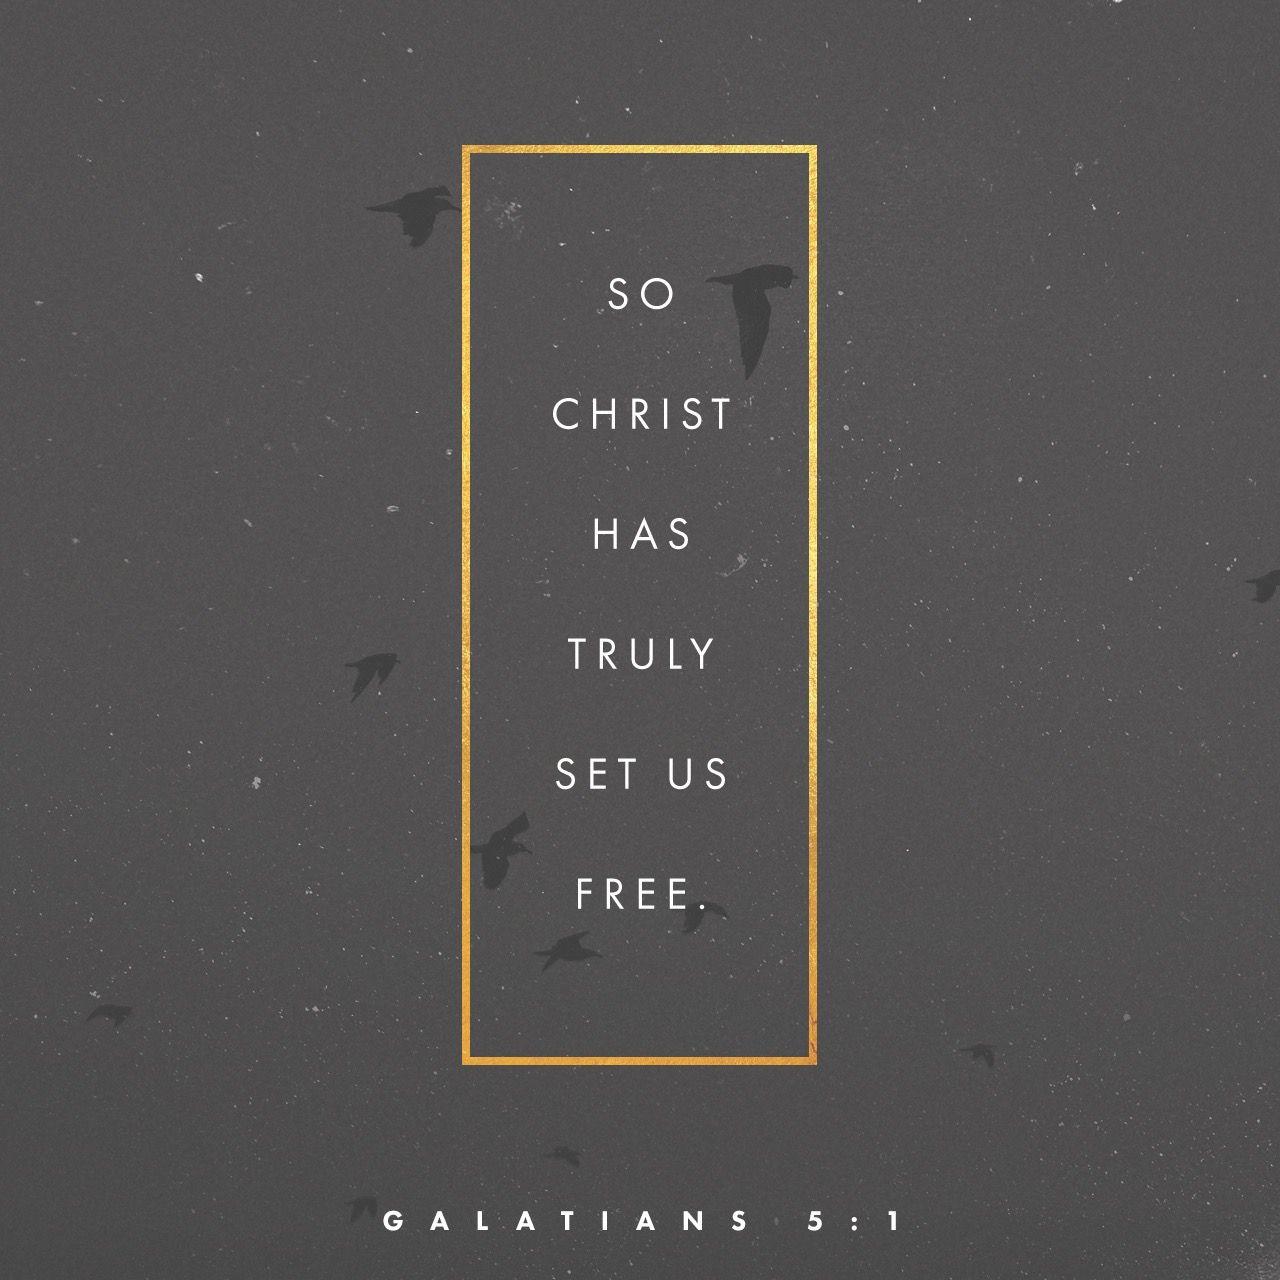 Galatians 51 NIV Bible apps, Freedom in christ